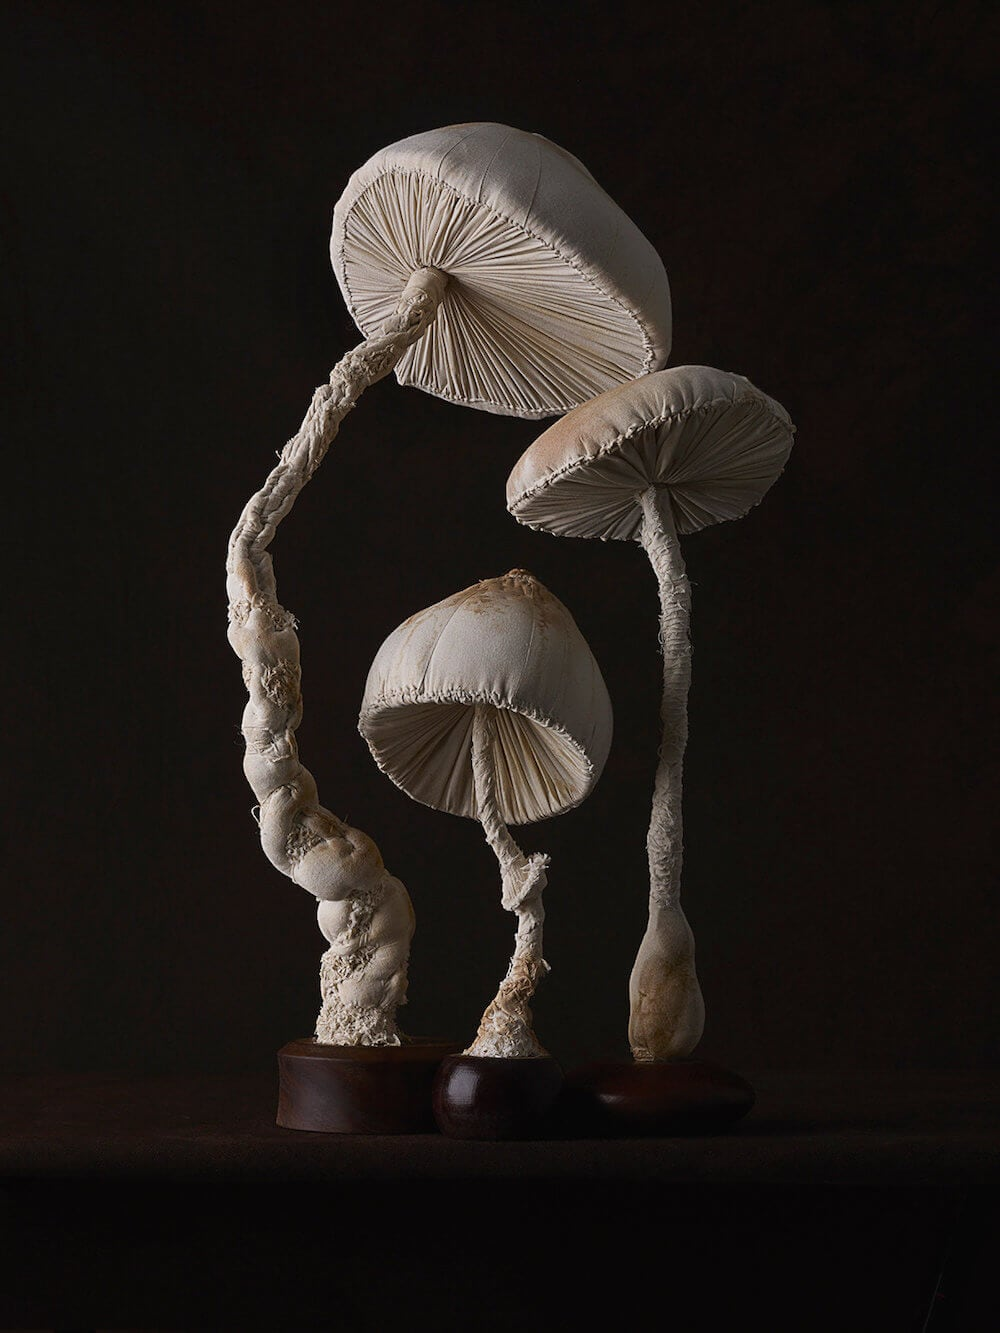 toadstool-sculptures-mister-finch-freeyork-7